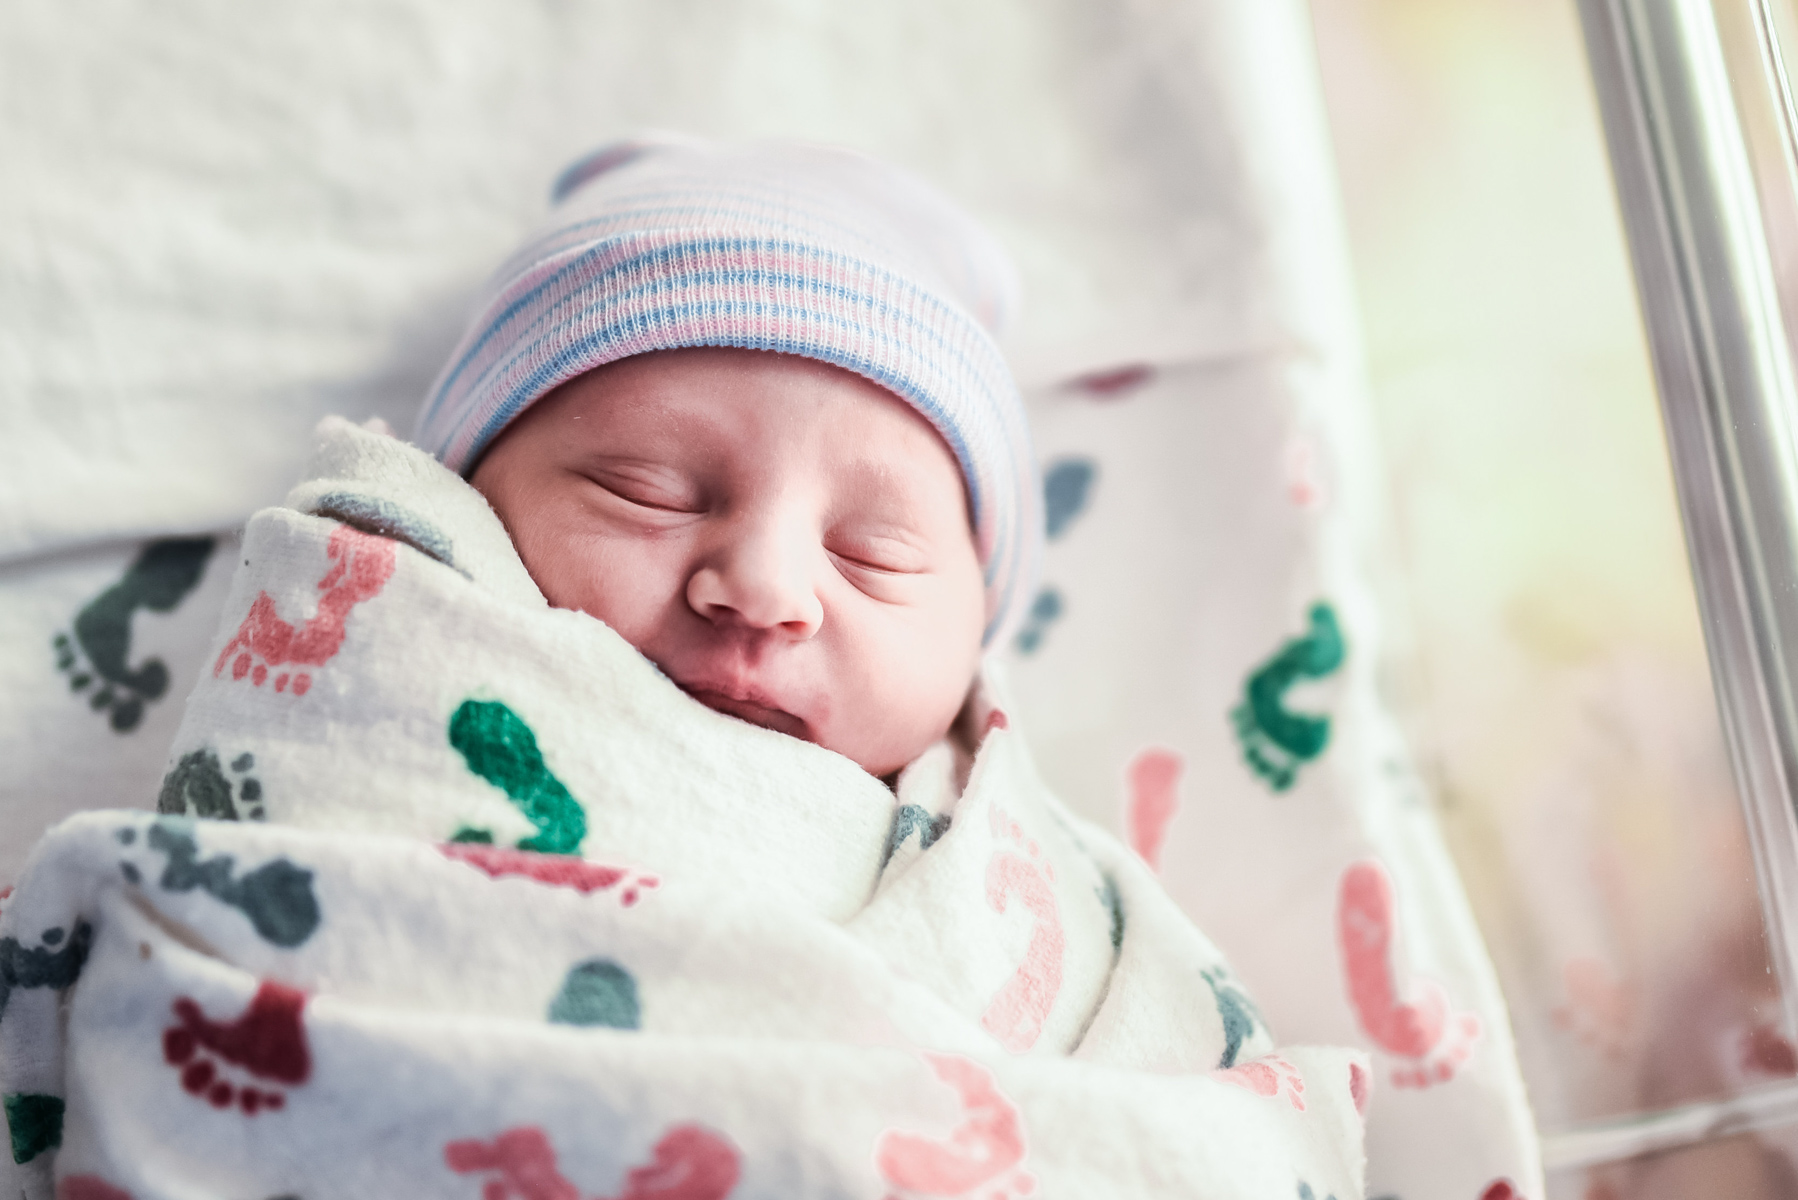 denver-birth-photographer-baby-rose-birth